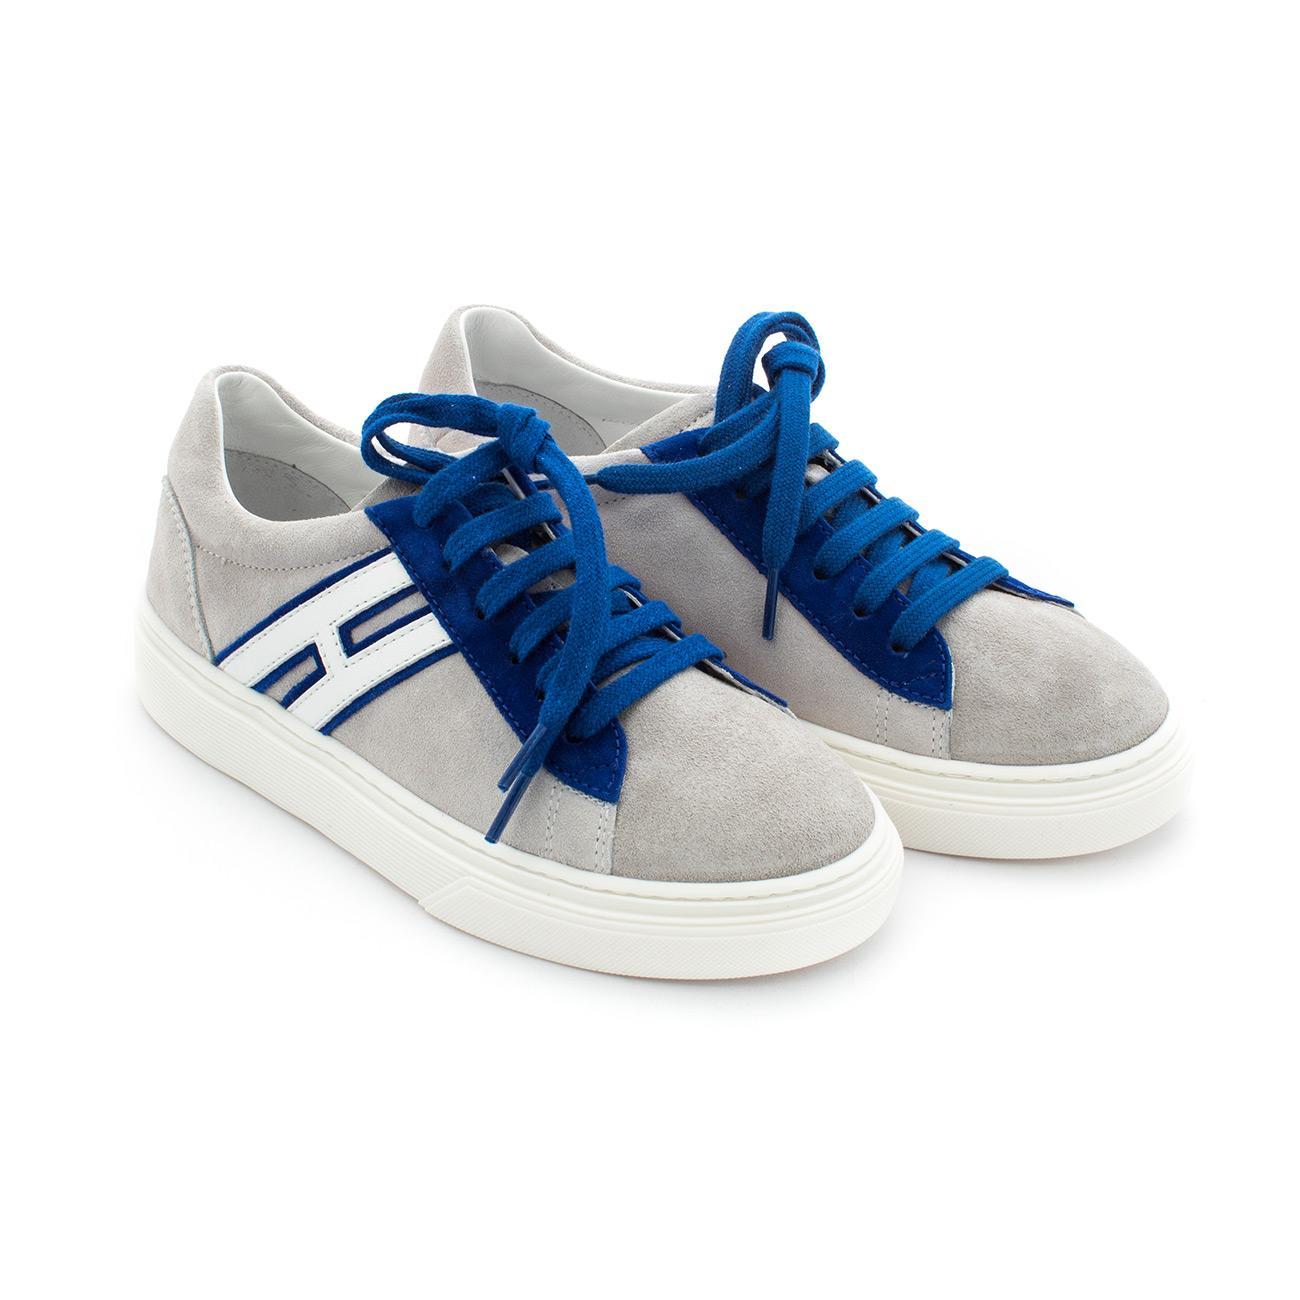 Scarpa Sneaker H365 Grigia E Blu Bambino Baby